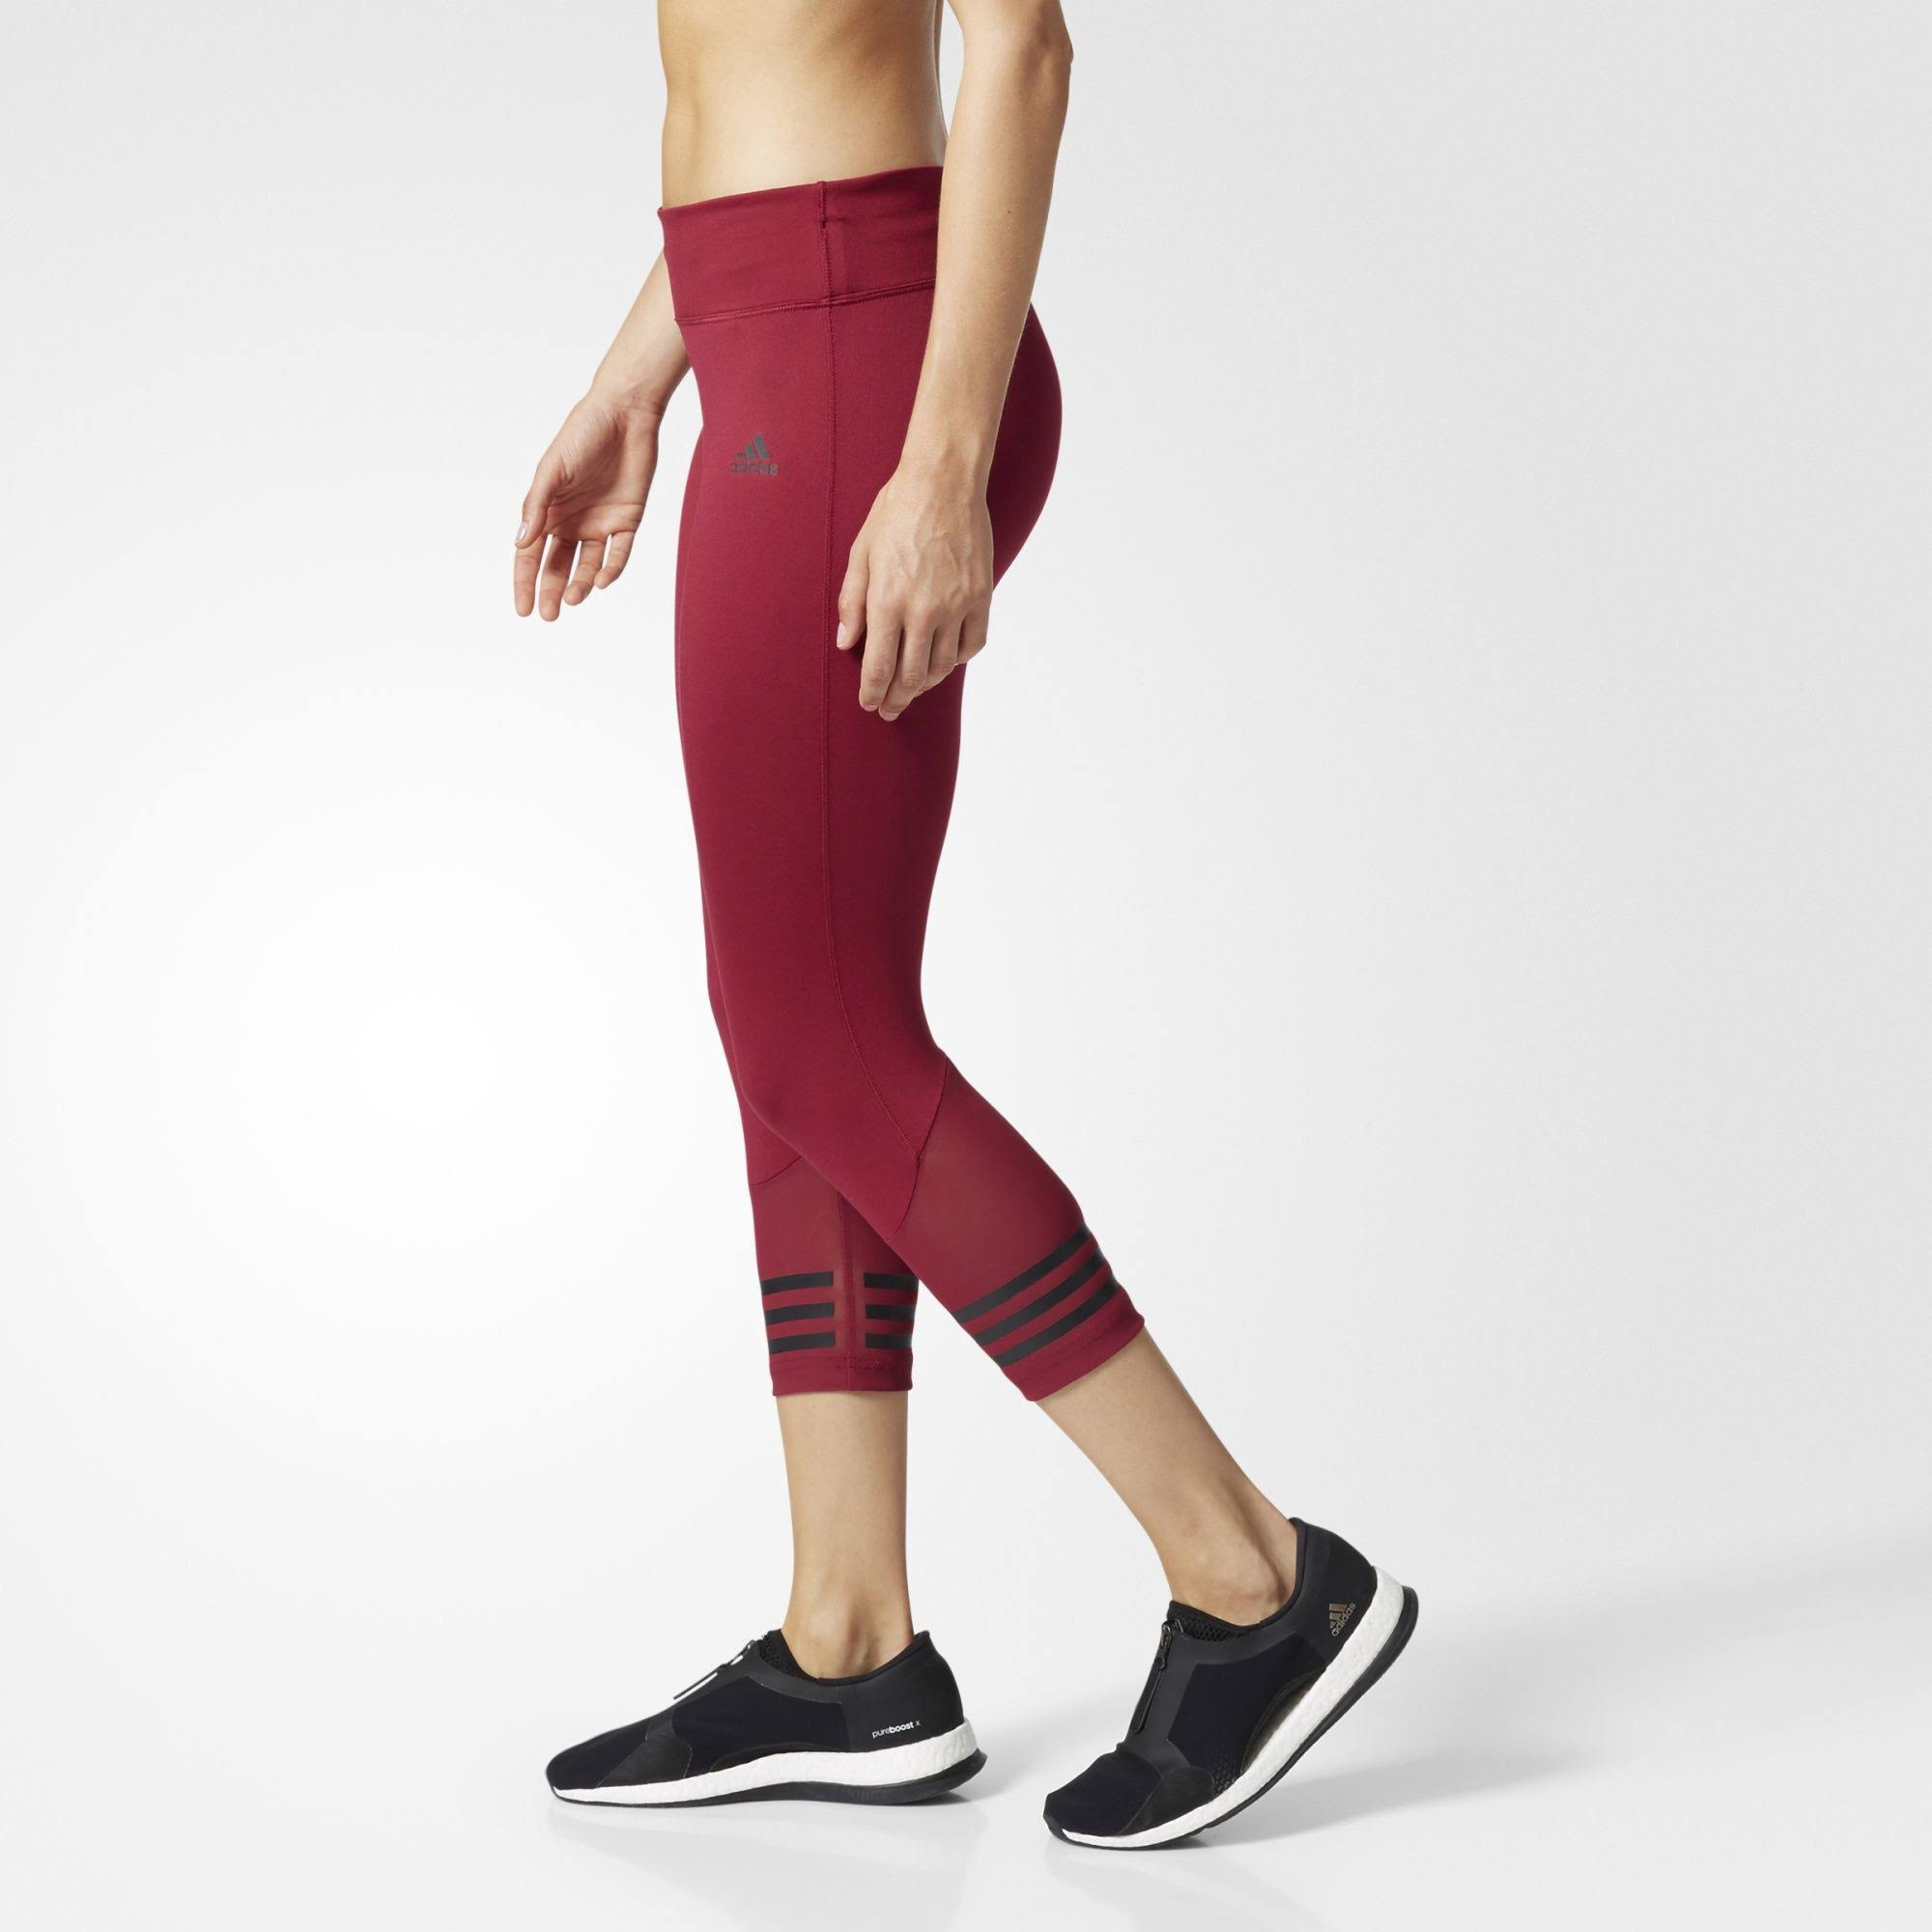 Move Damen Rot 3 Regular 2 S Strumpfhose Adidas Design 4 4qE88x